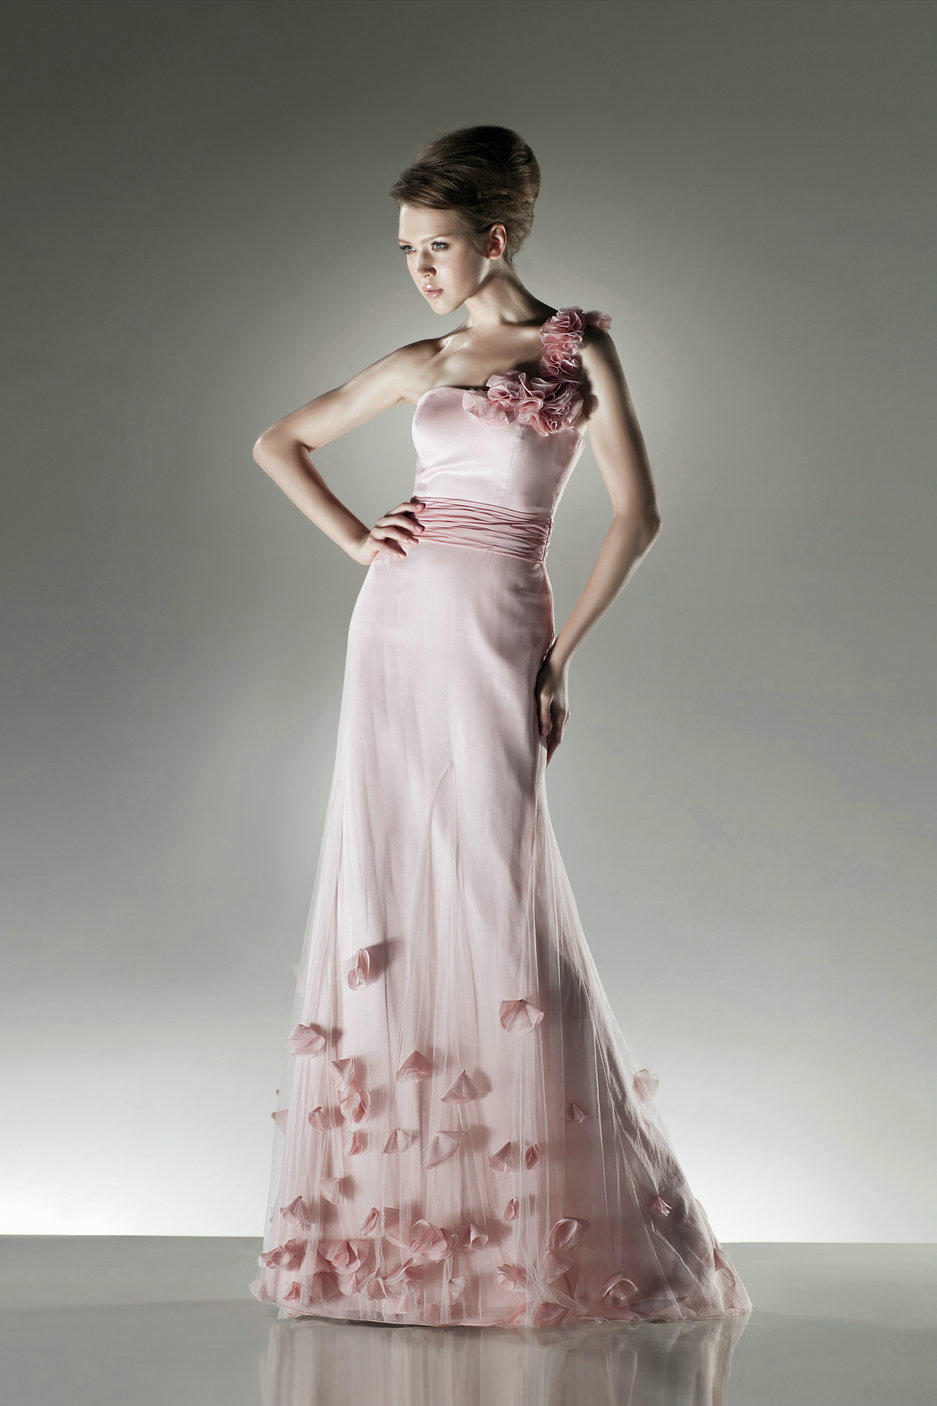 WhiteAzalea Evening Dresses: Evening Dresses with Floral ...